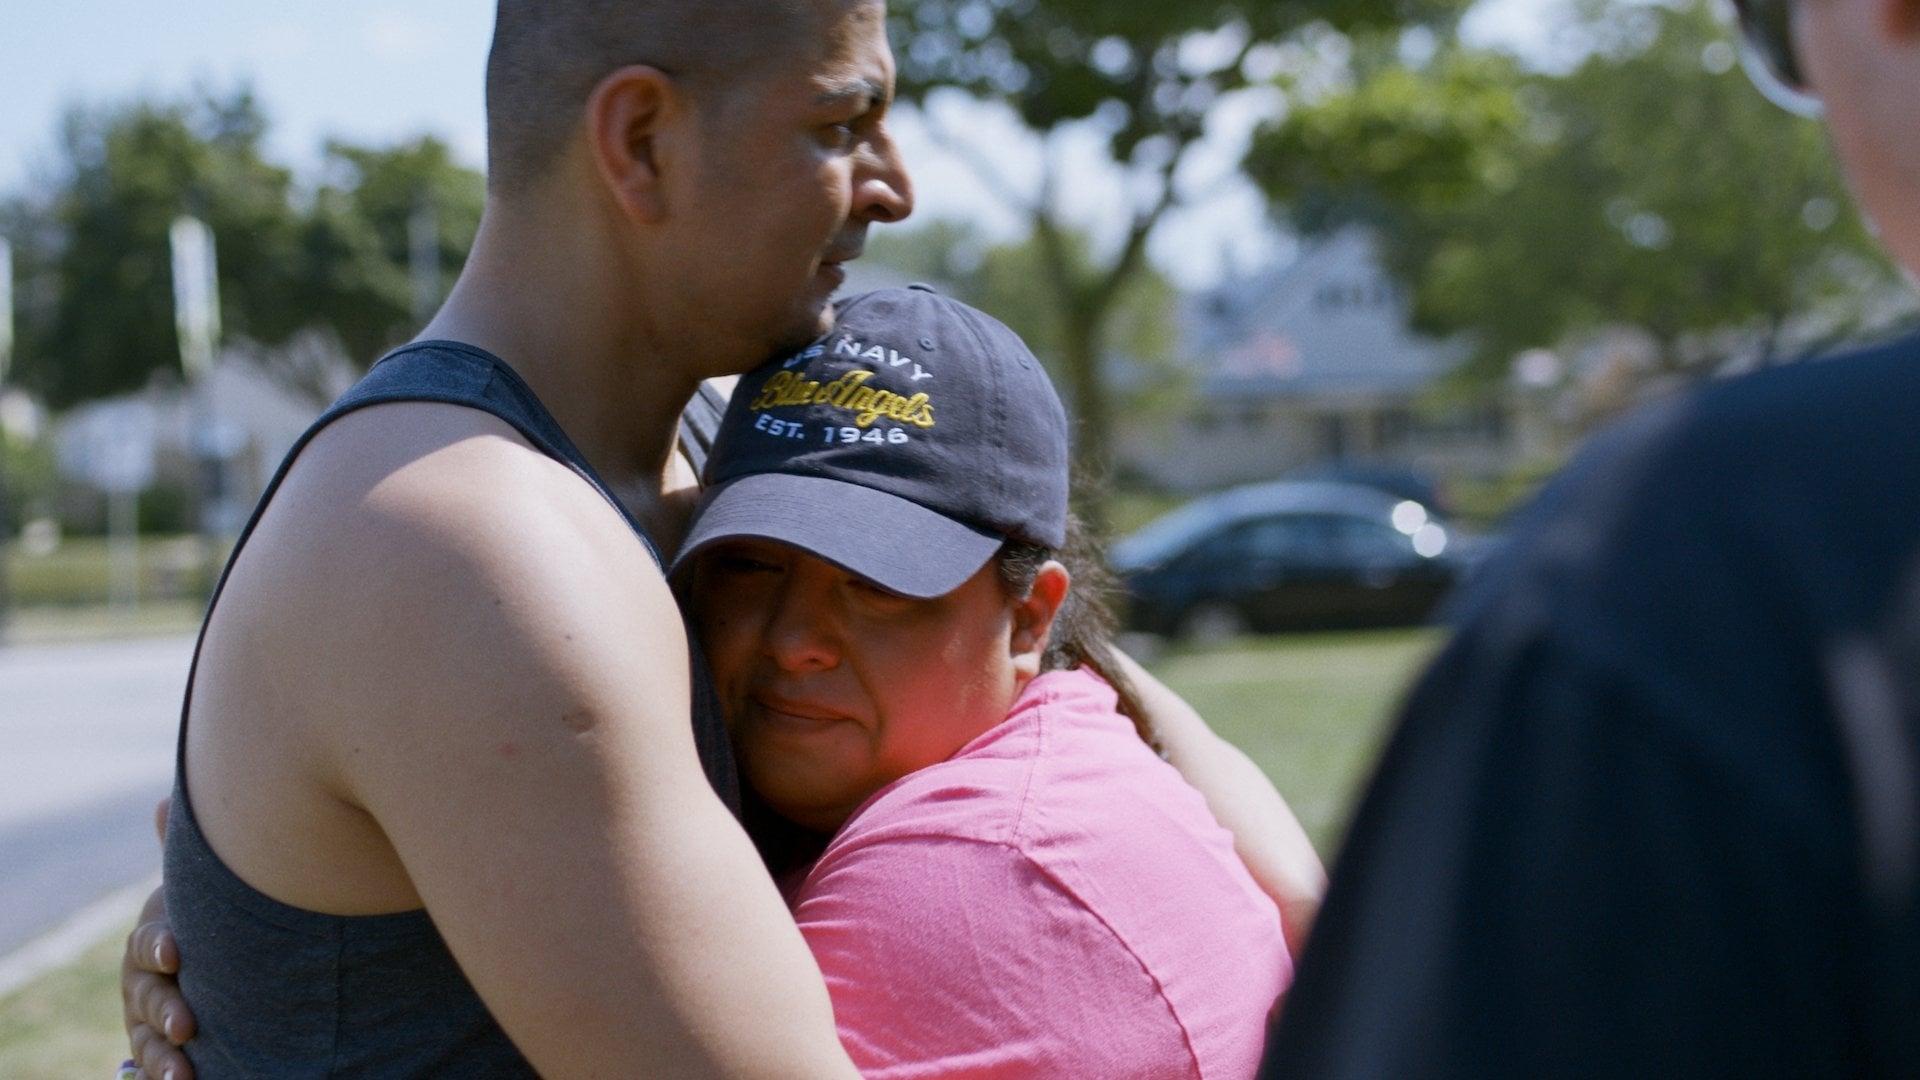 Watch Living Undocumented Season 1 Episode 5 full episode online free